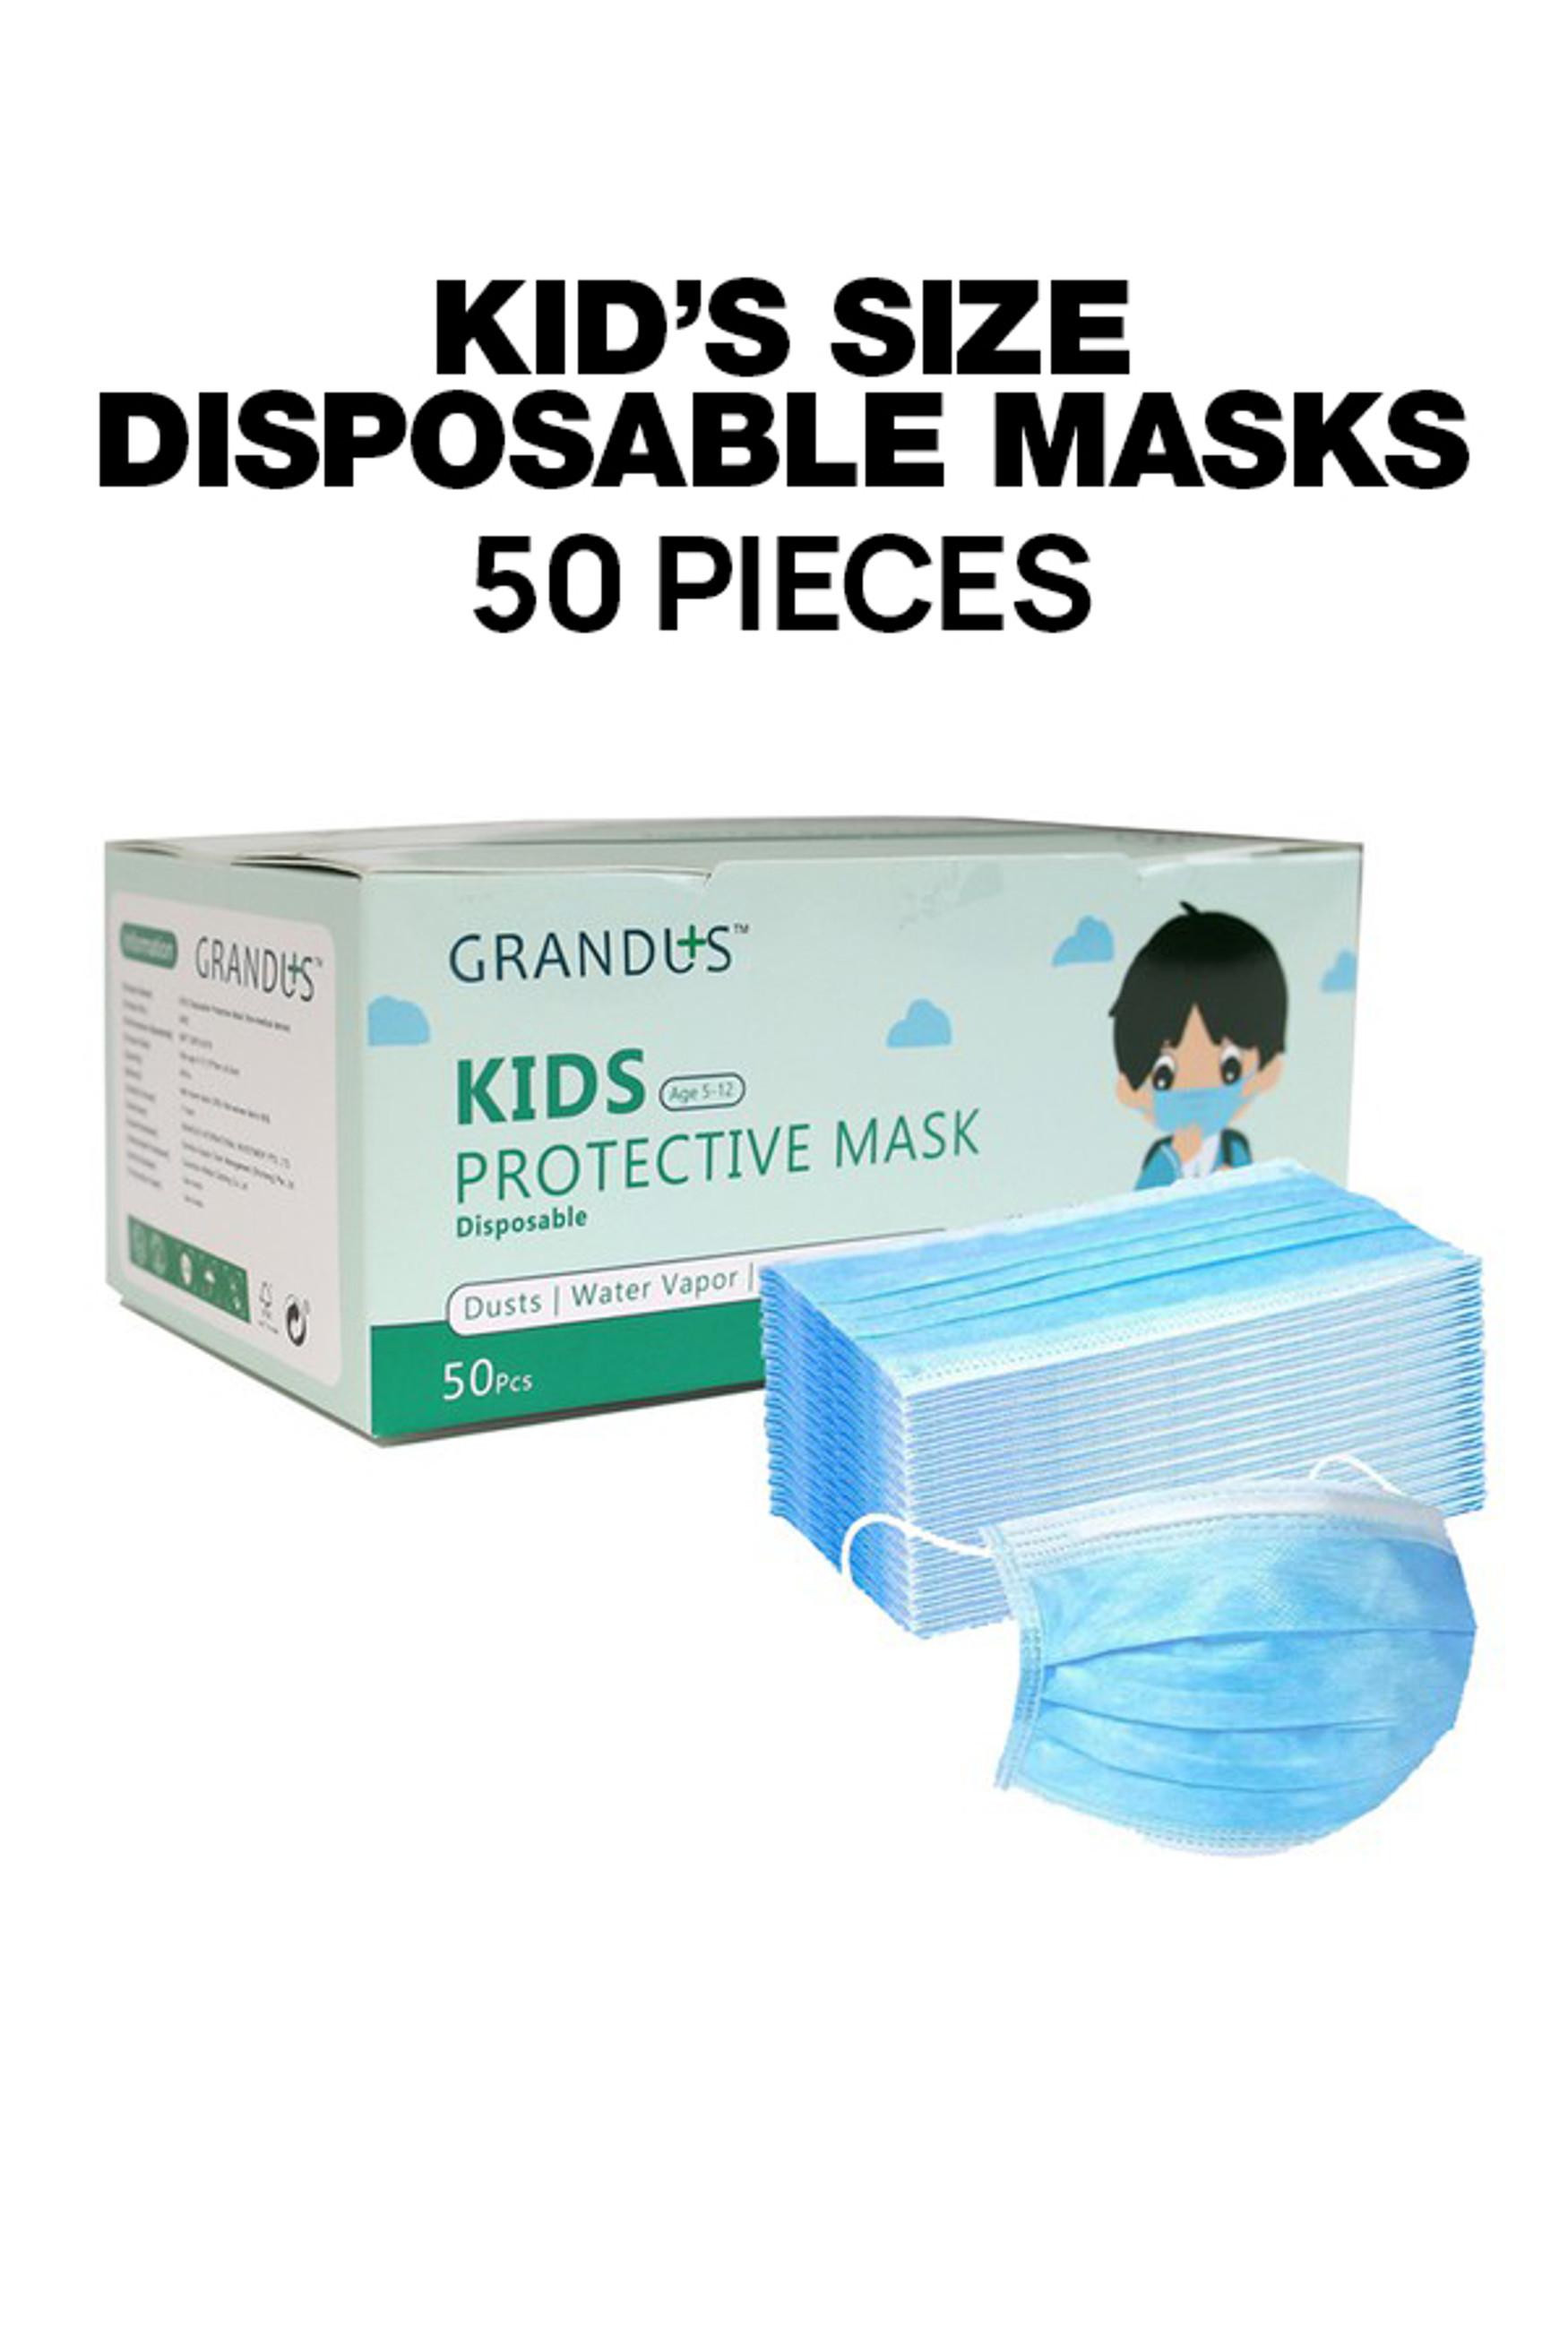 50 Piece Kid's Disposable Face Masks